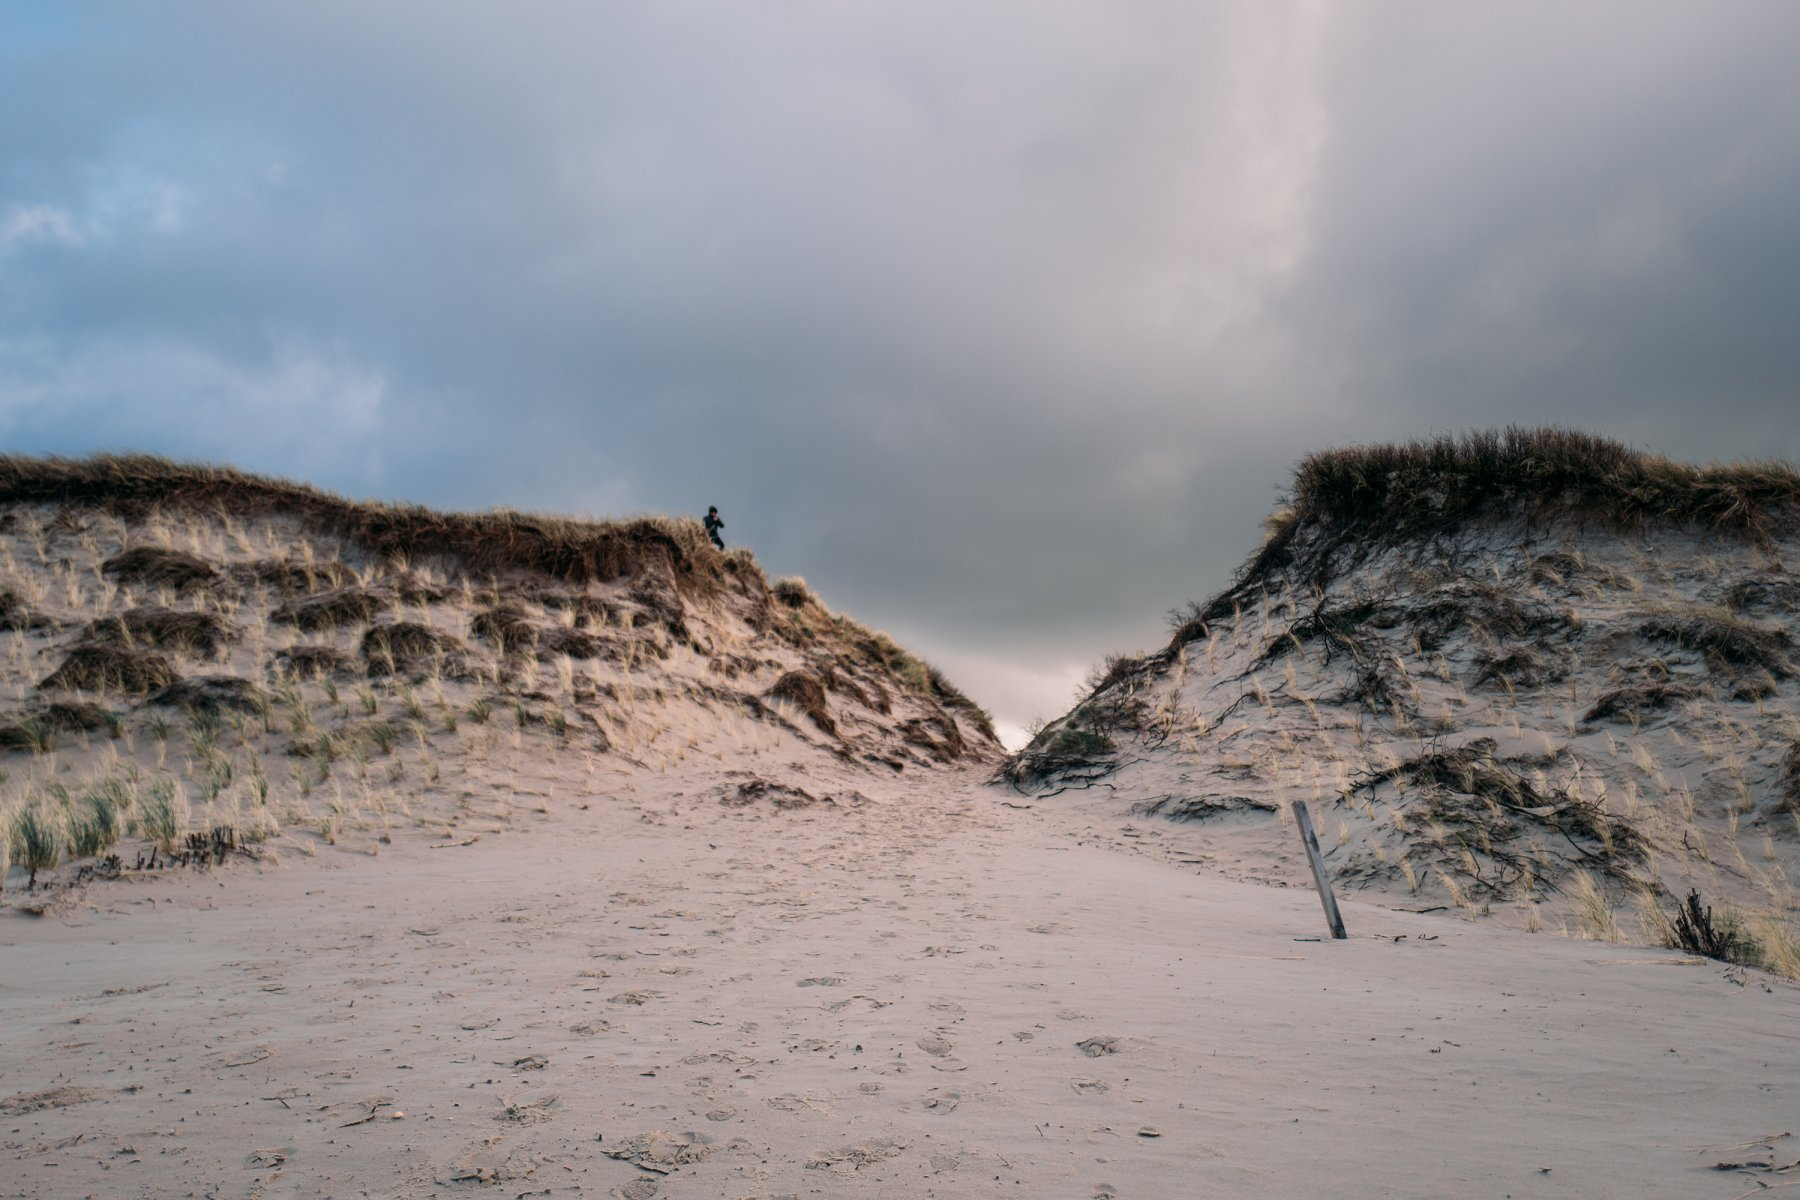 Geheimtipp Hamburg Nordsee Tourismus Winterkampagne 2019 Amrum Jan Traupe 14